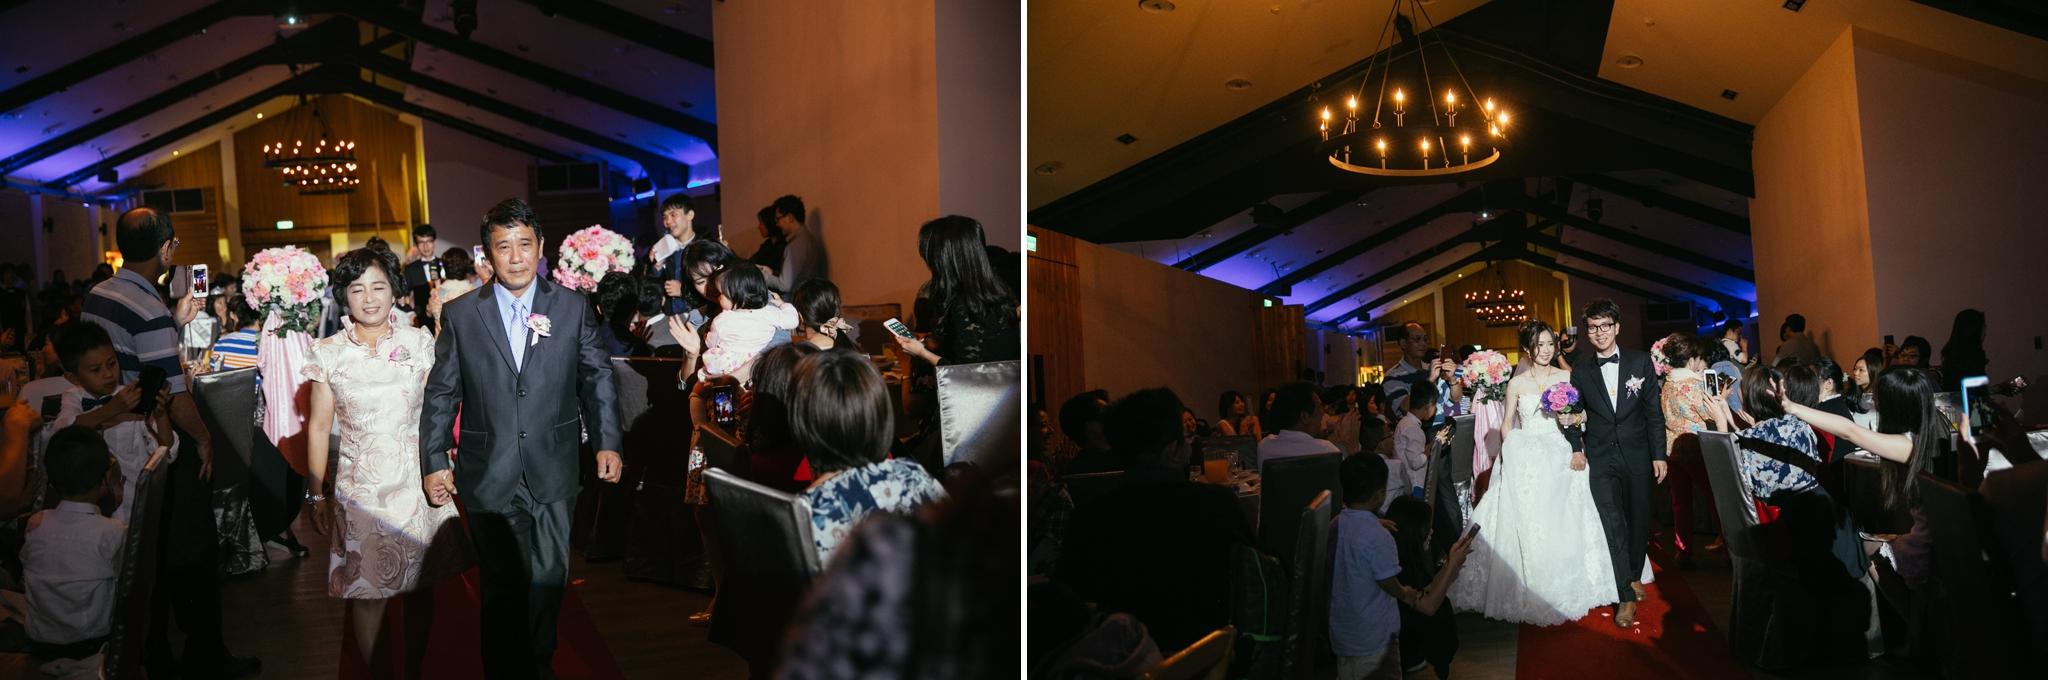 Tina+Nash-wedding-台北婚禮迎娶晚宴-新莊終身大事-127.jpg